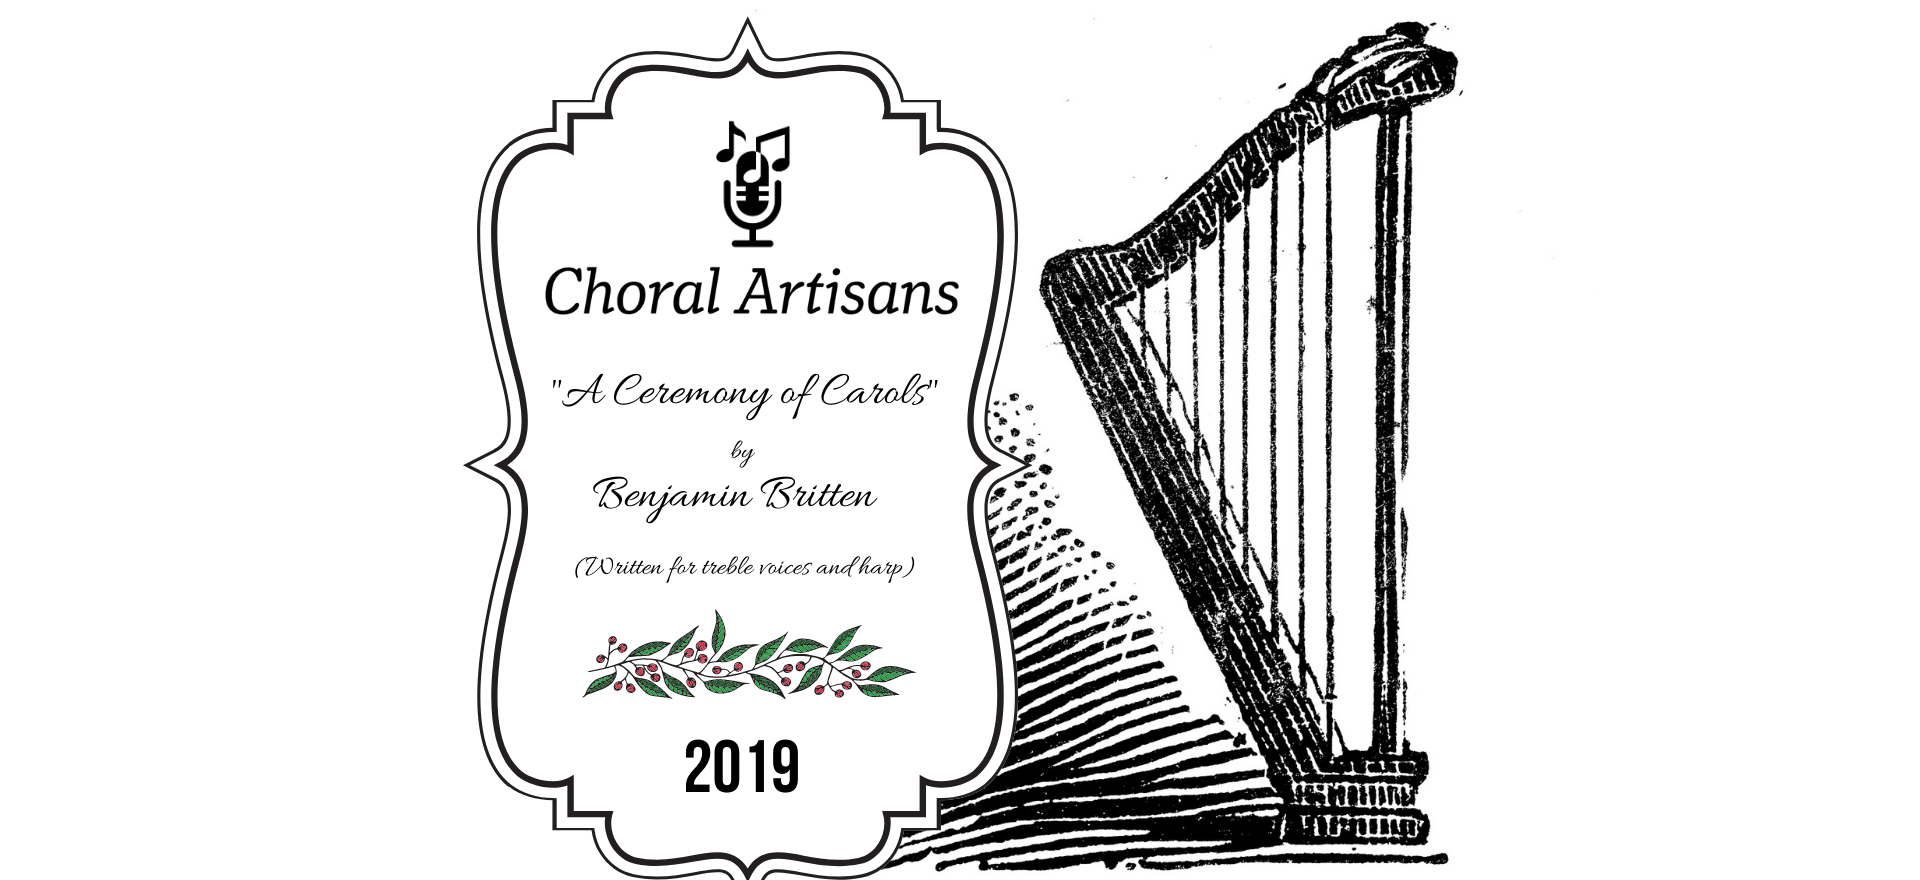 Choral Artisans - Christmas 2019